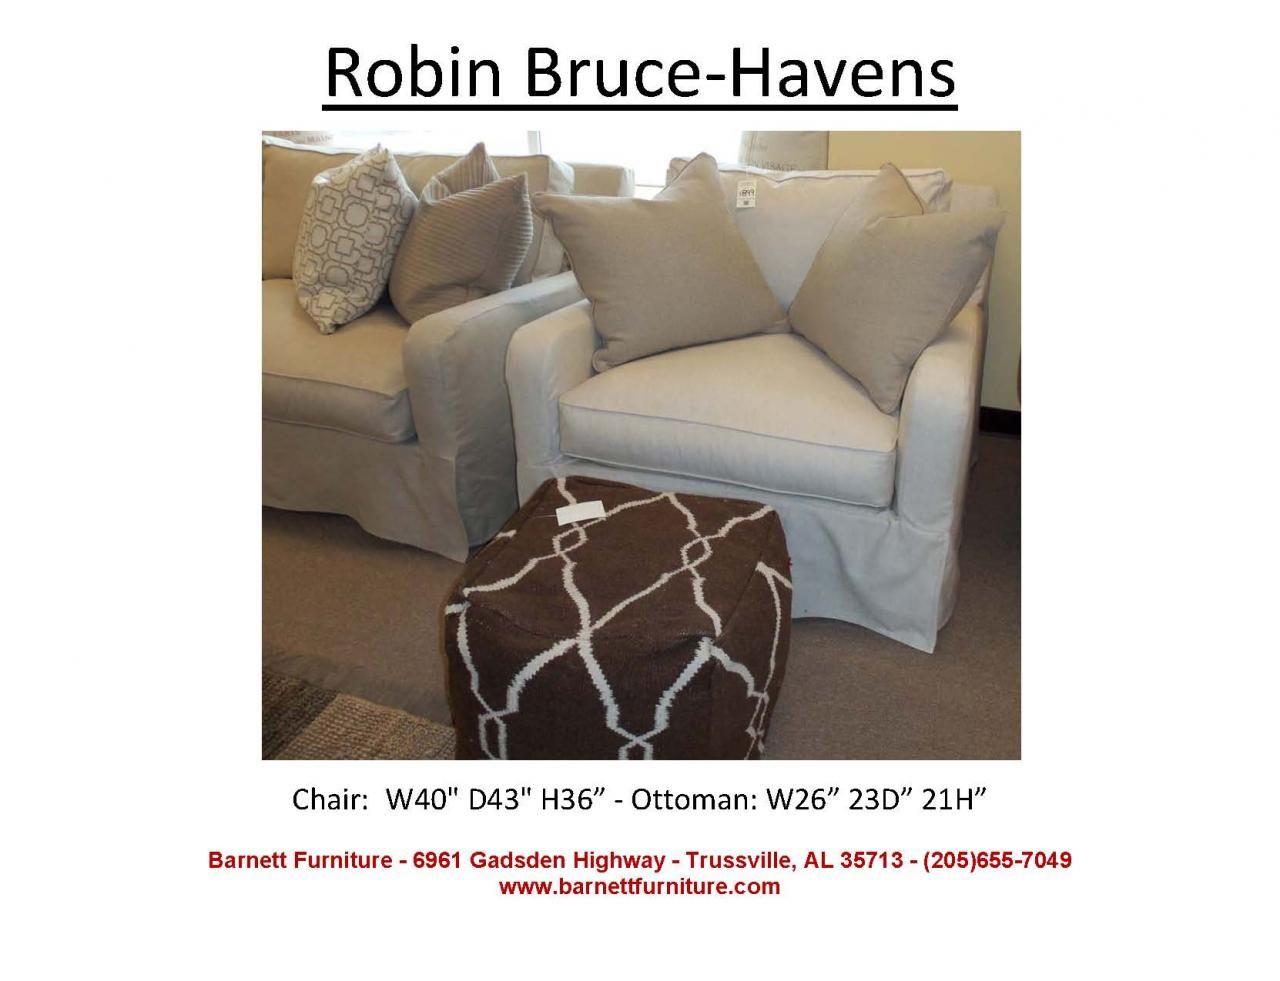 Robin Bruce Havens Slipcover Chair At Barnett Furniture In Trussville /  Birmingham, Alabama